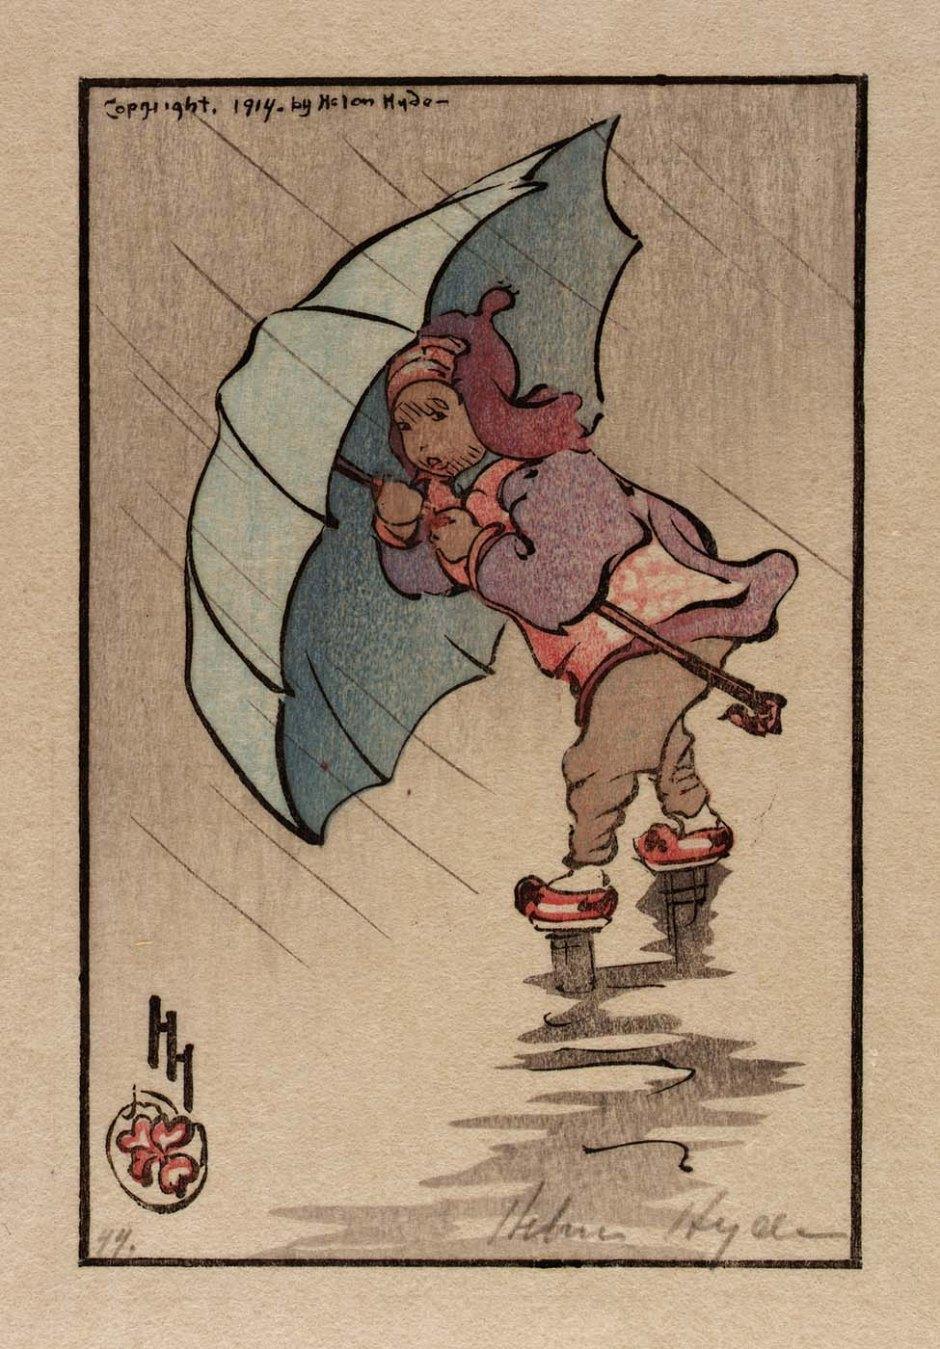 hydeblueumbrella